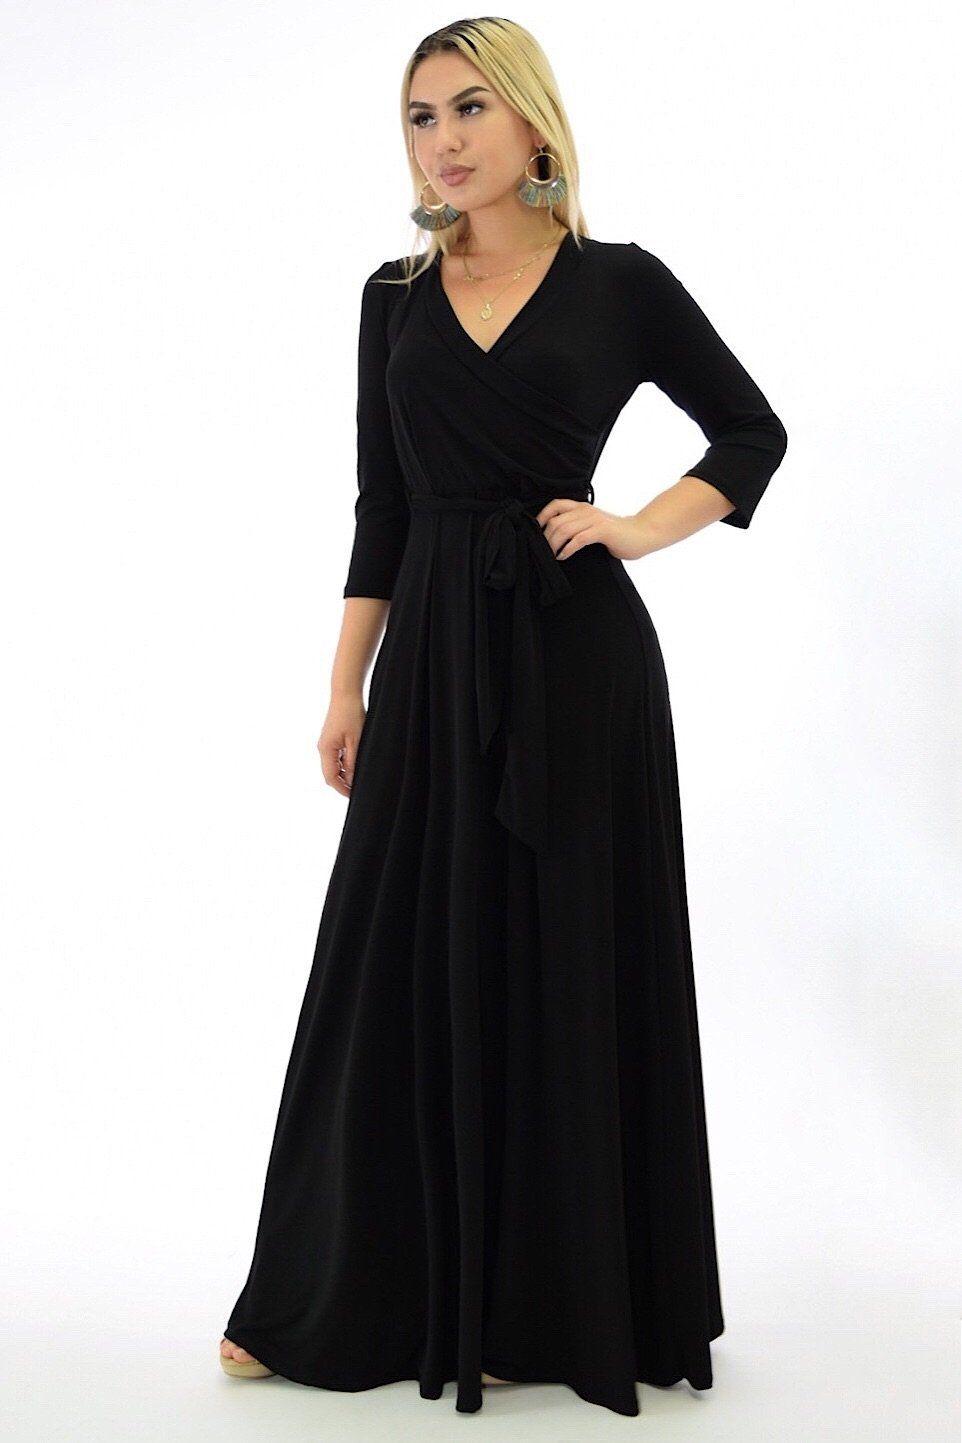 Angelina 3/4 sleeve black flowy maxi dress Dresses